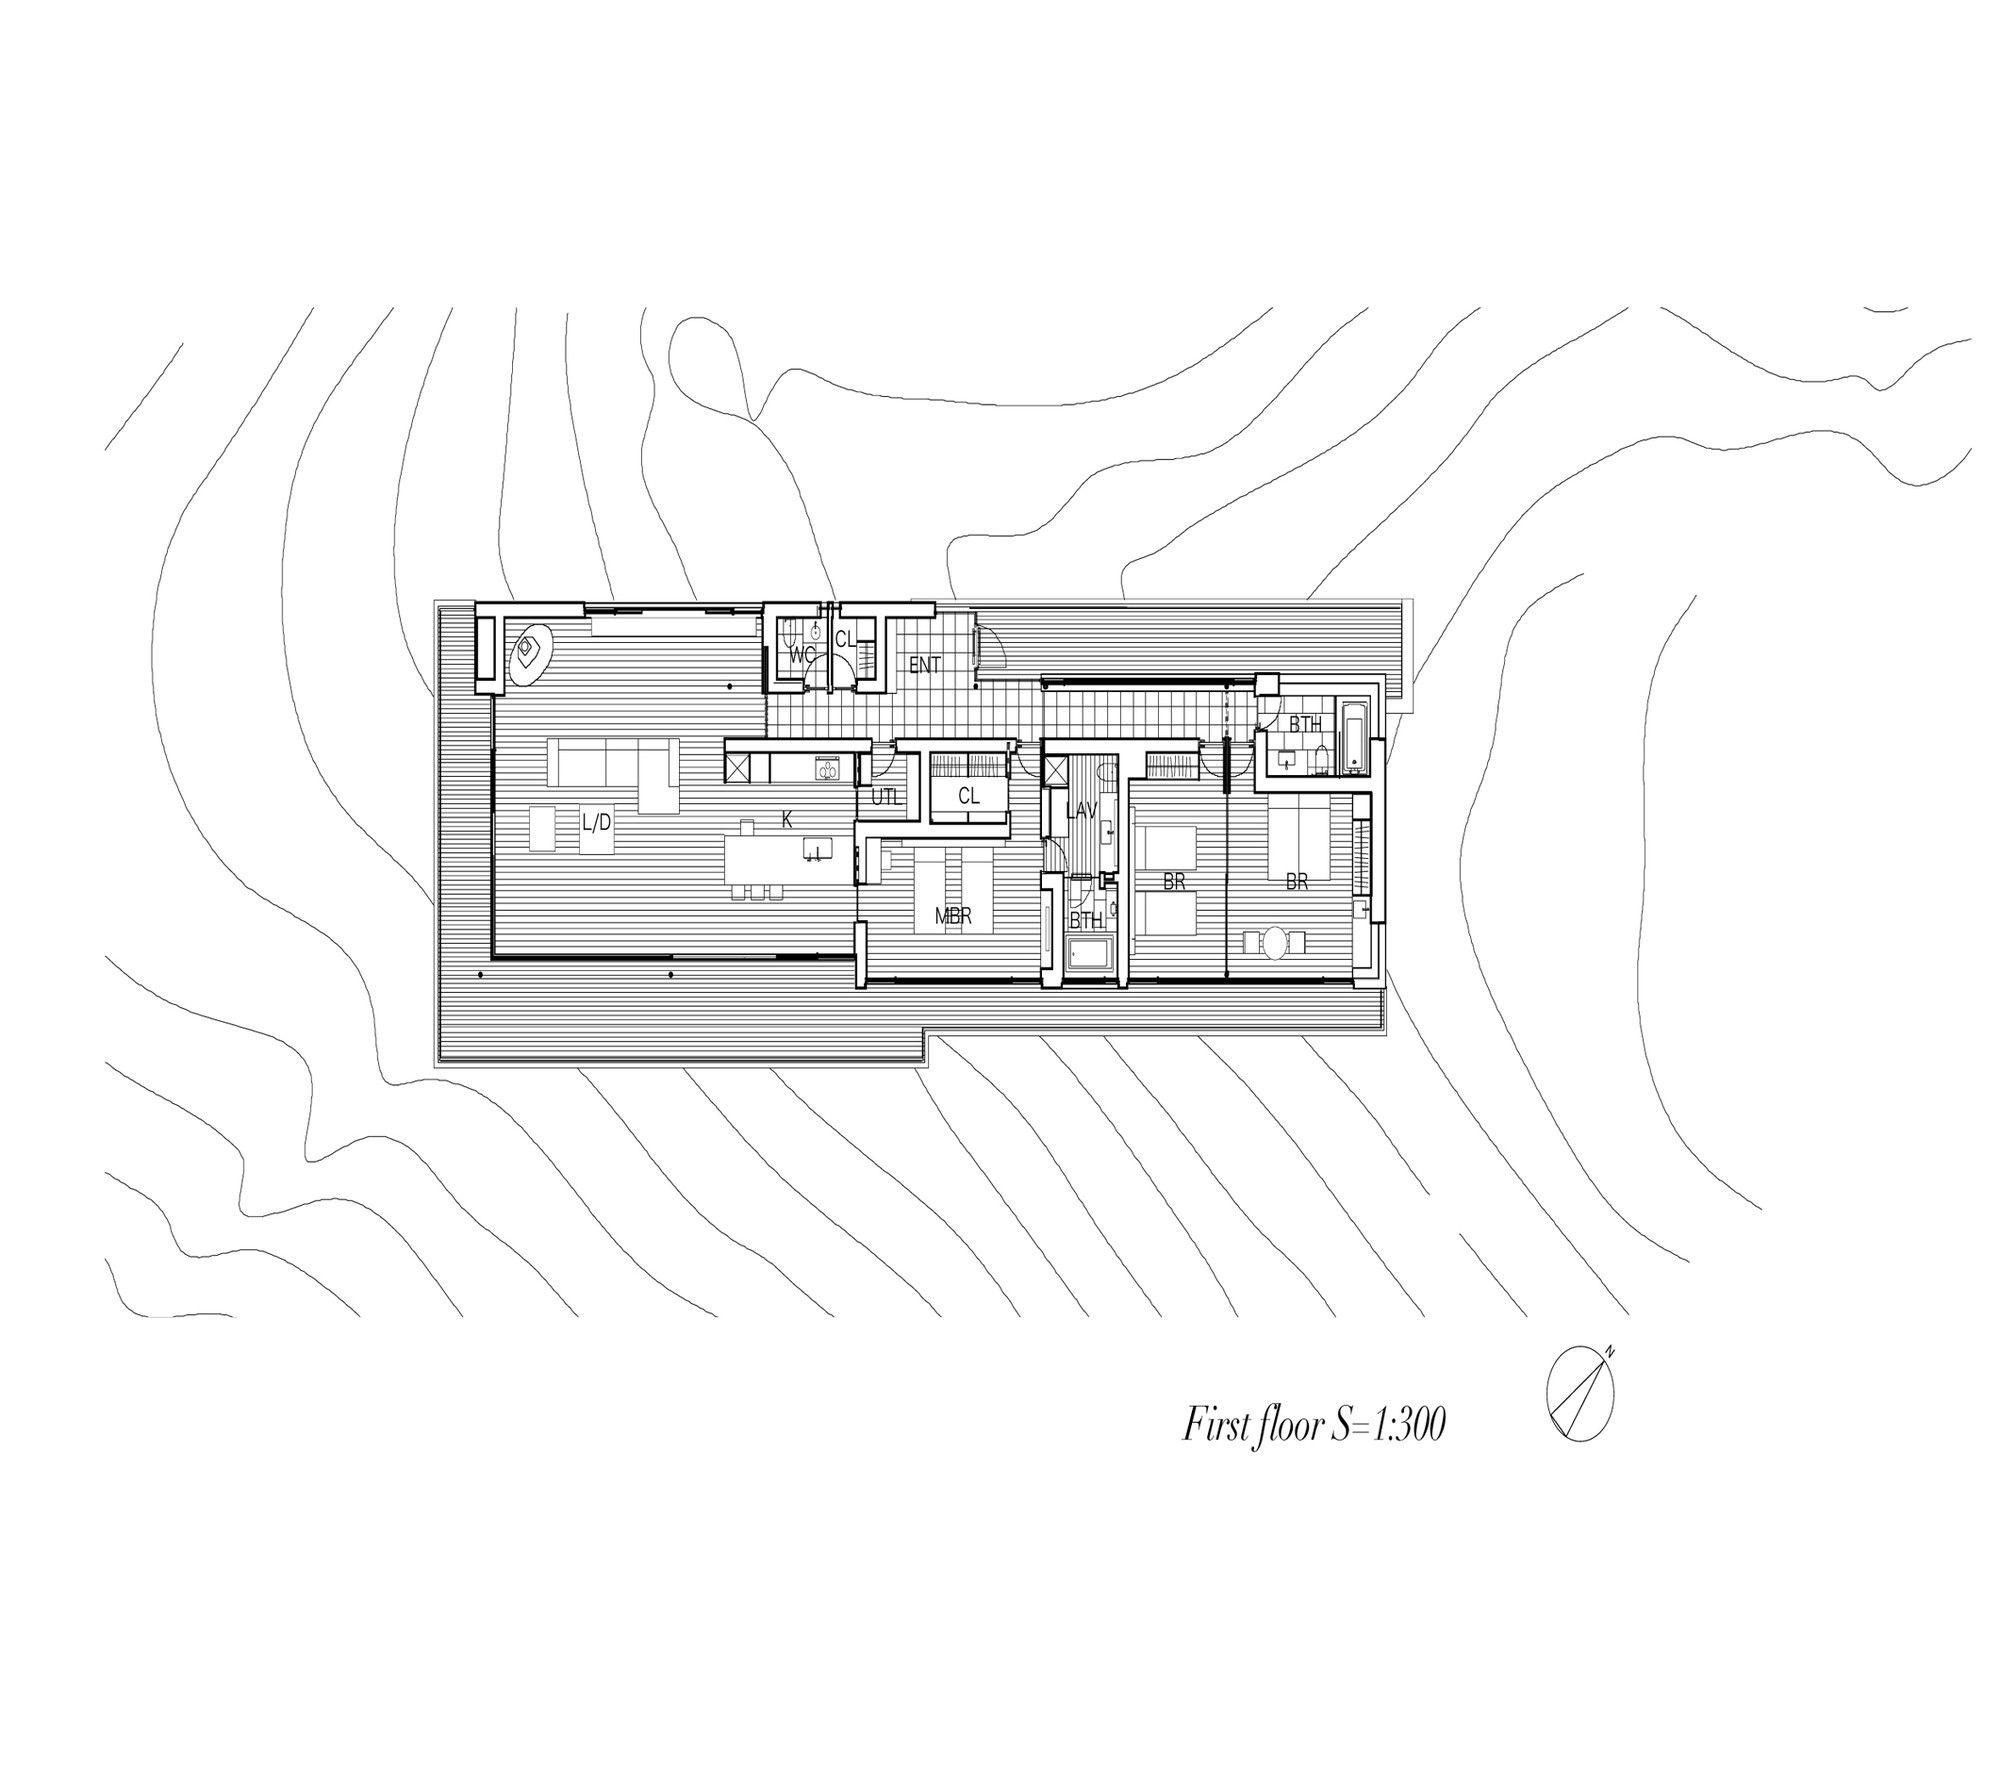 Image 32 of 34 from gallery of House in Yatsugatake / Kidosaki Architects Studio. First Floor Plan